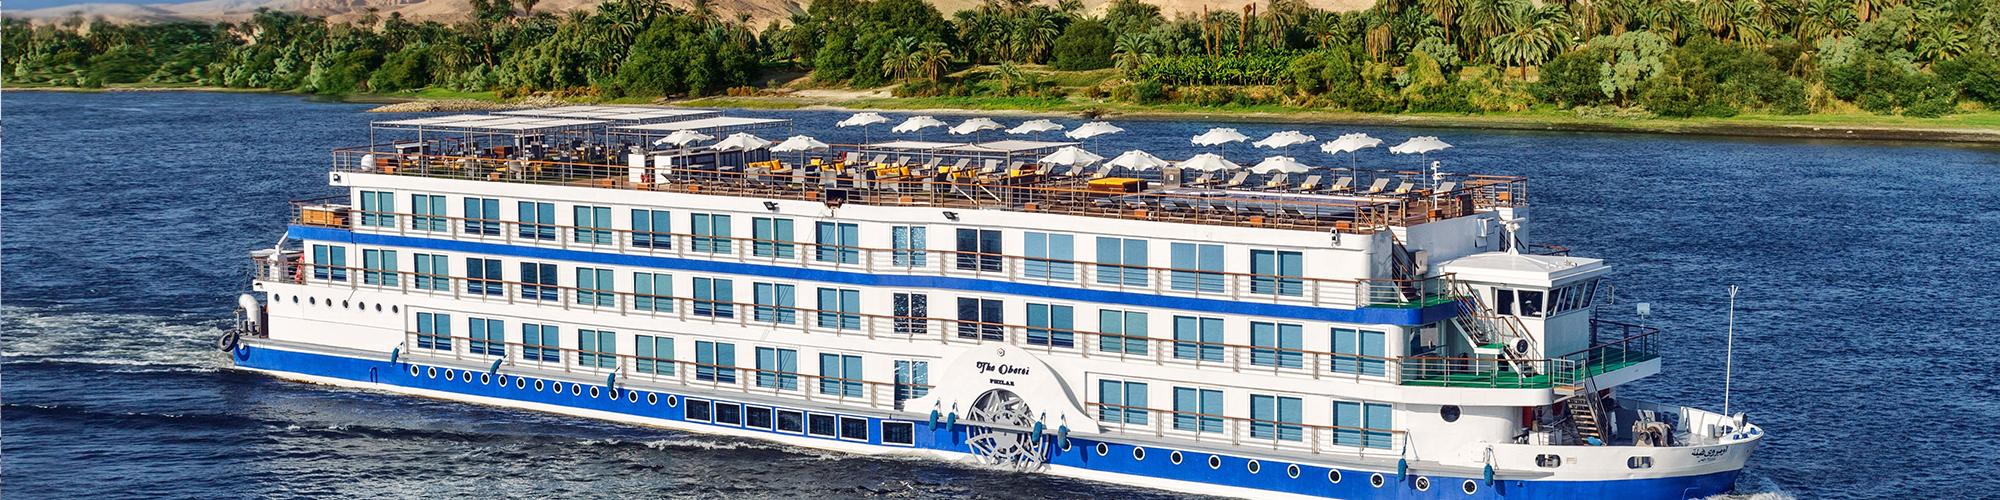 Nile Cruise From Marsa Alam - Marsa Alam Nile Cruise Tours - Tours From Hurghada